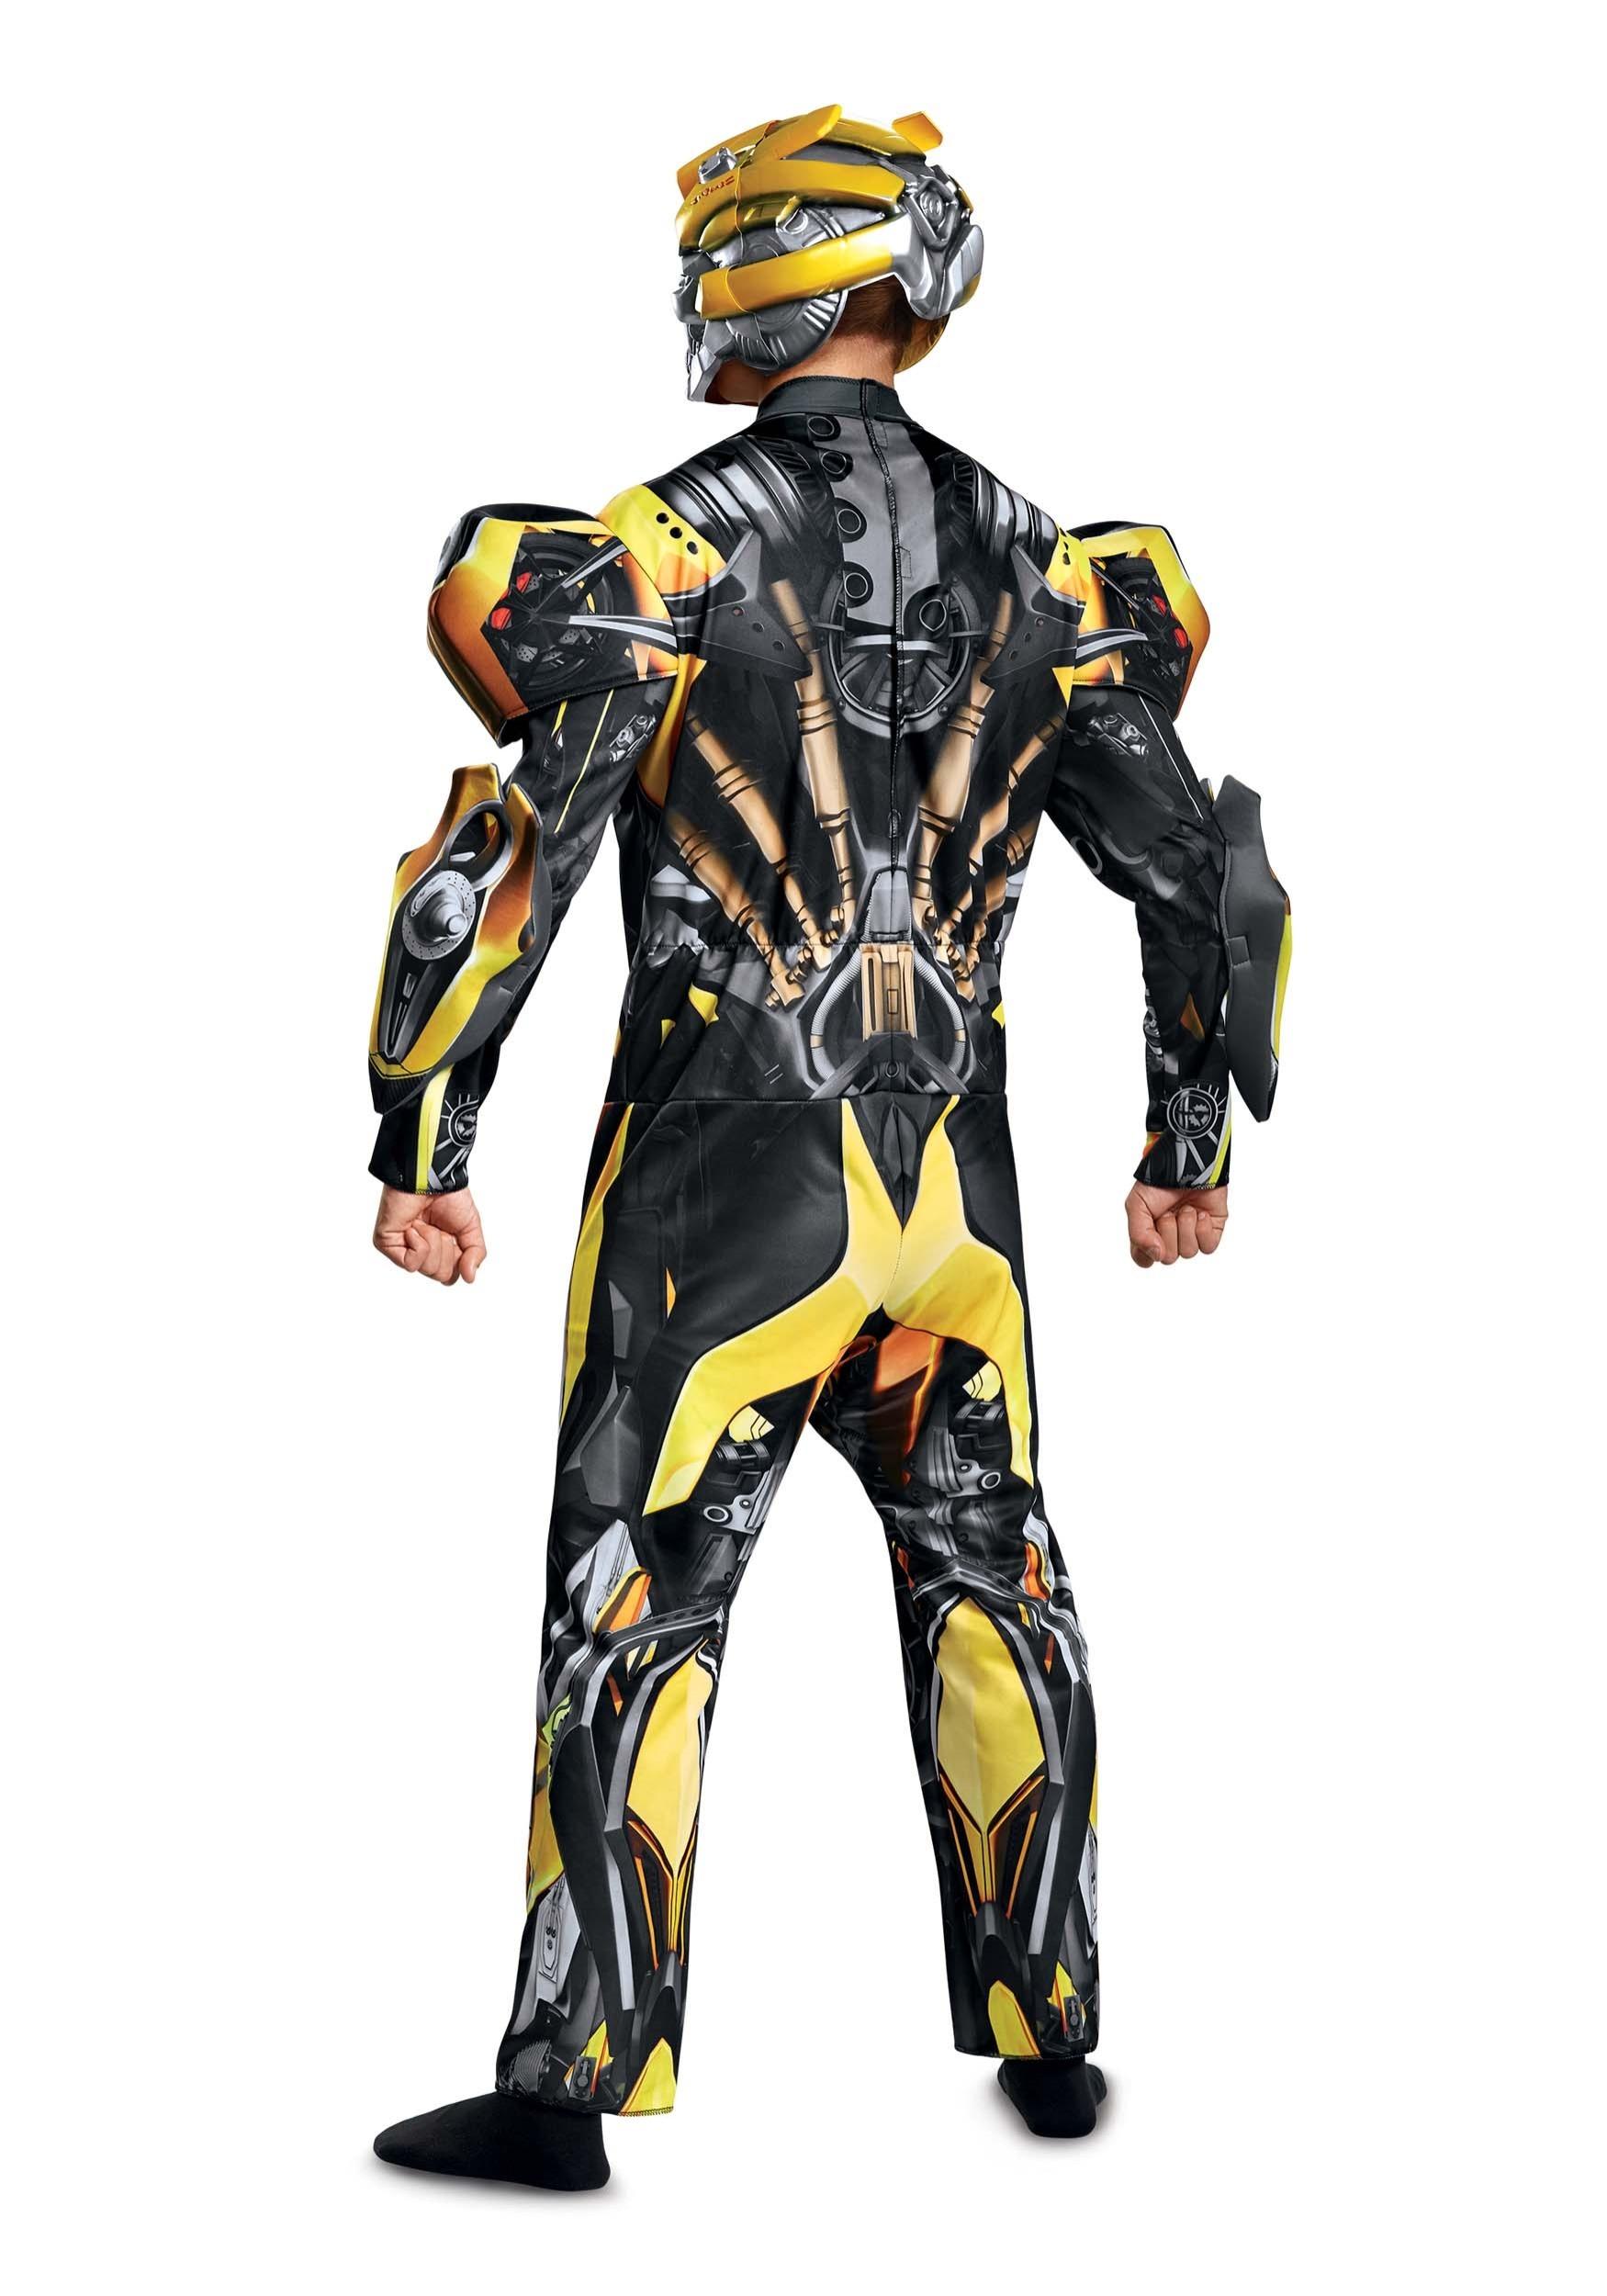 Transformers 5 Adult Deluxe Bumblebee Costume alt 31e20f6c3